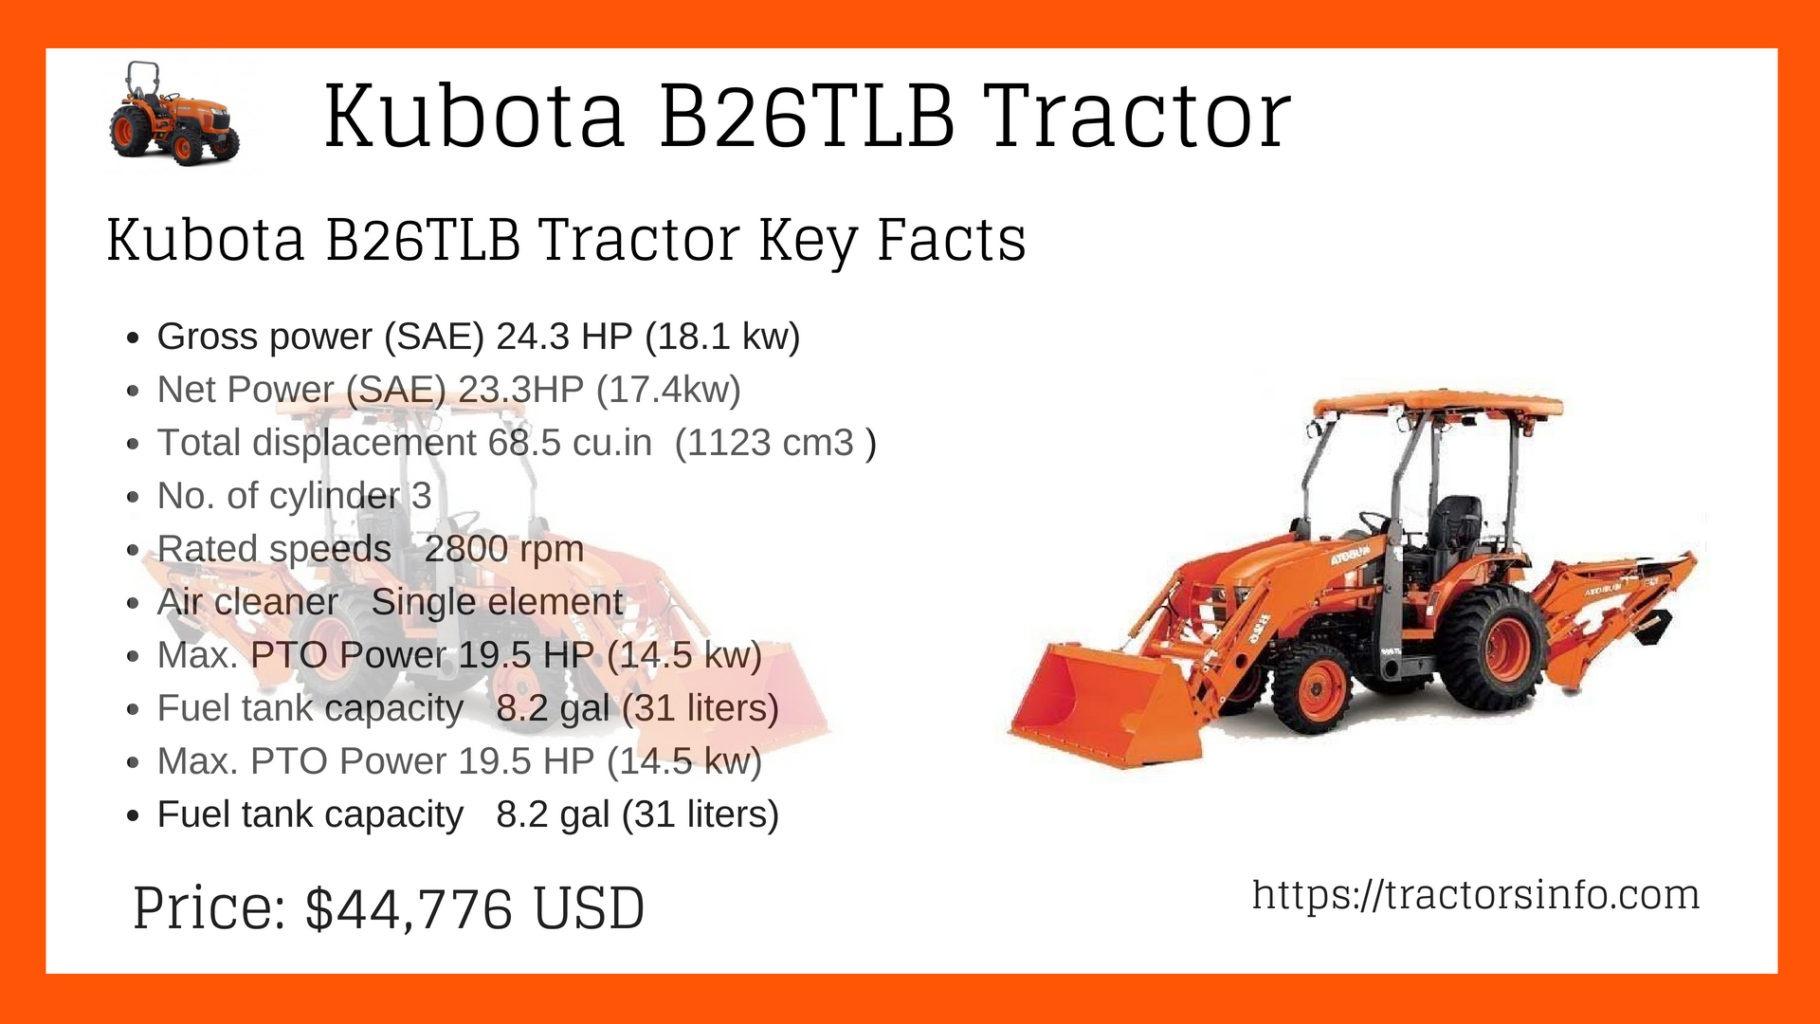 Kubota B26 TLB (Tractor, Loader, Backhoe)